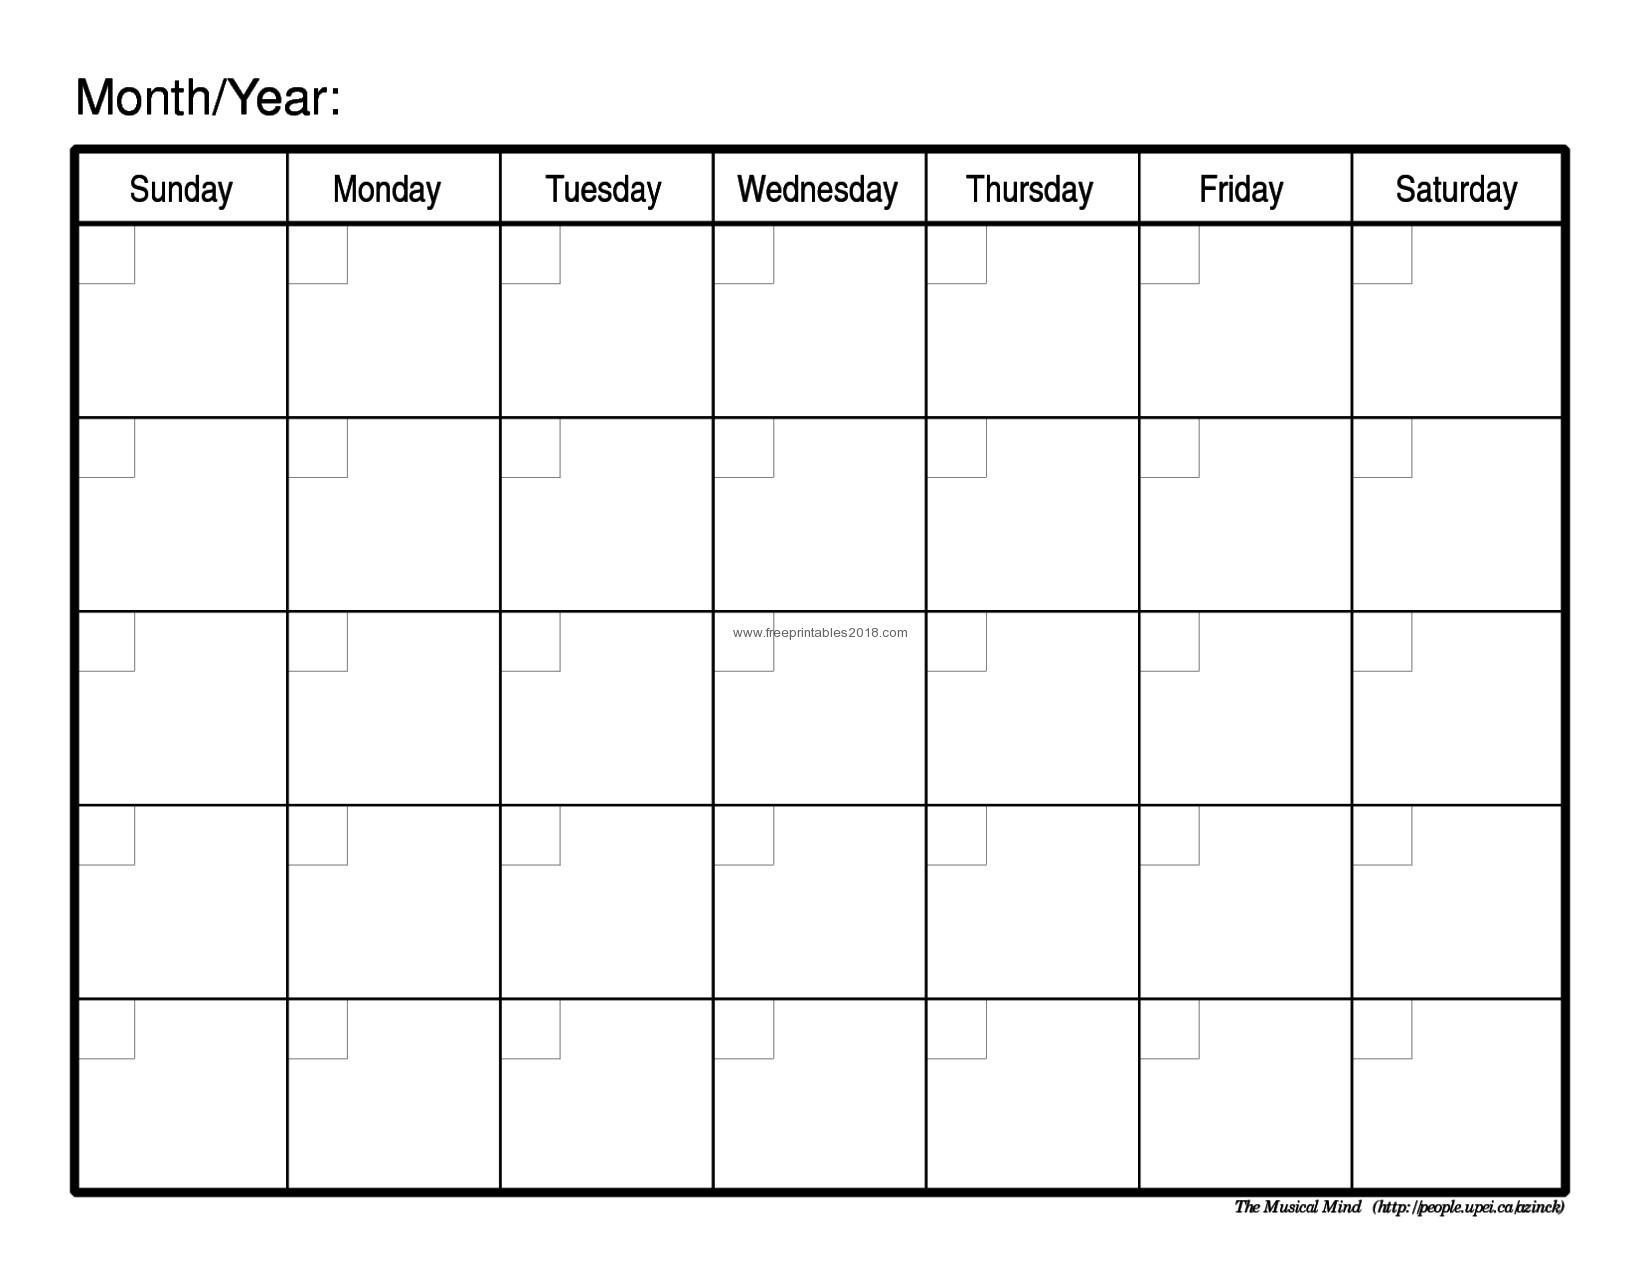 Free Printable Calendar Blank Free Printable Blank Calendar inside Printable Blank Calendar Template